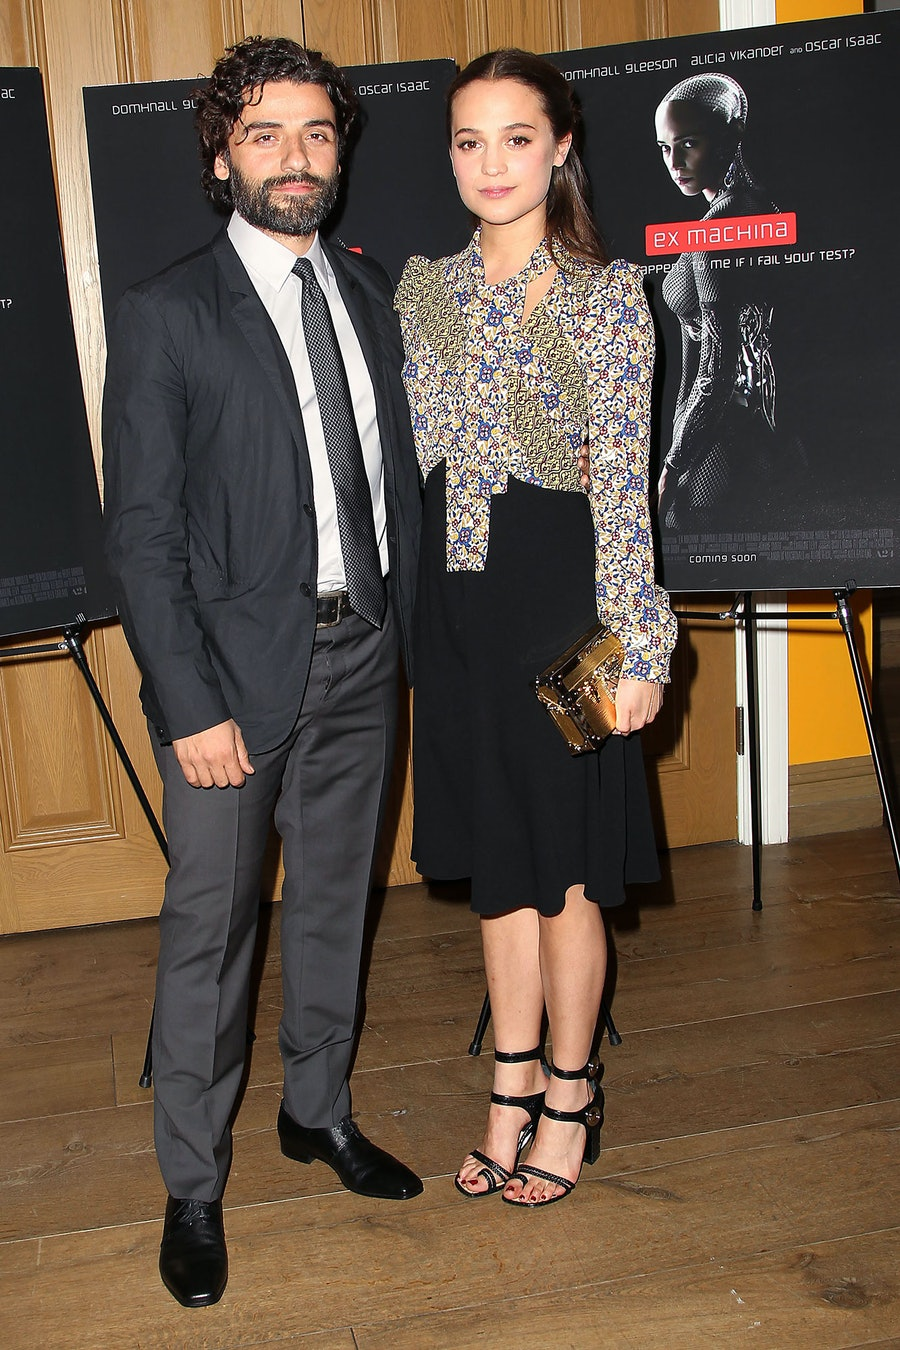 Alicia Vikander and Oscar Isaac